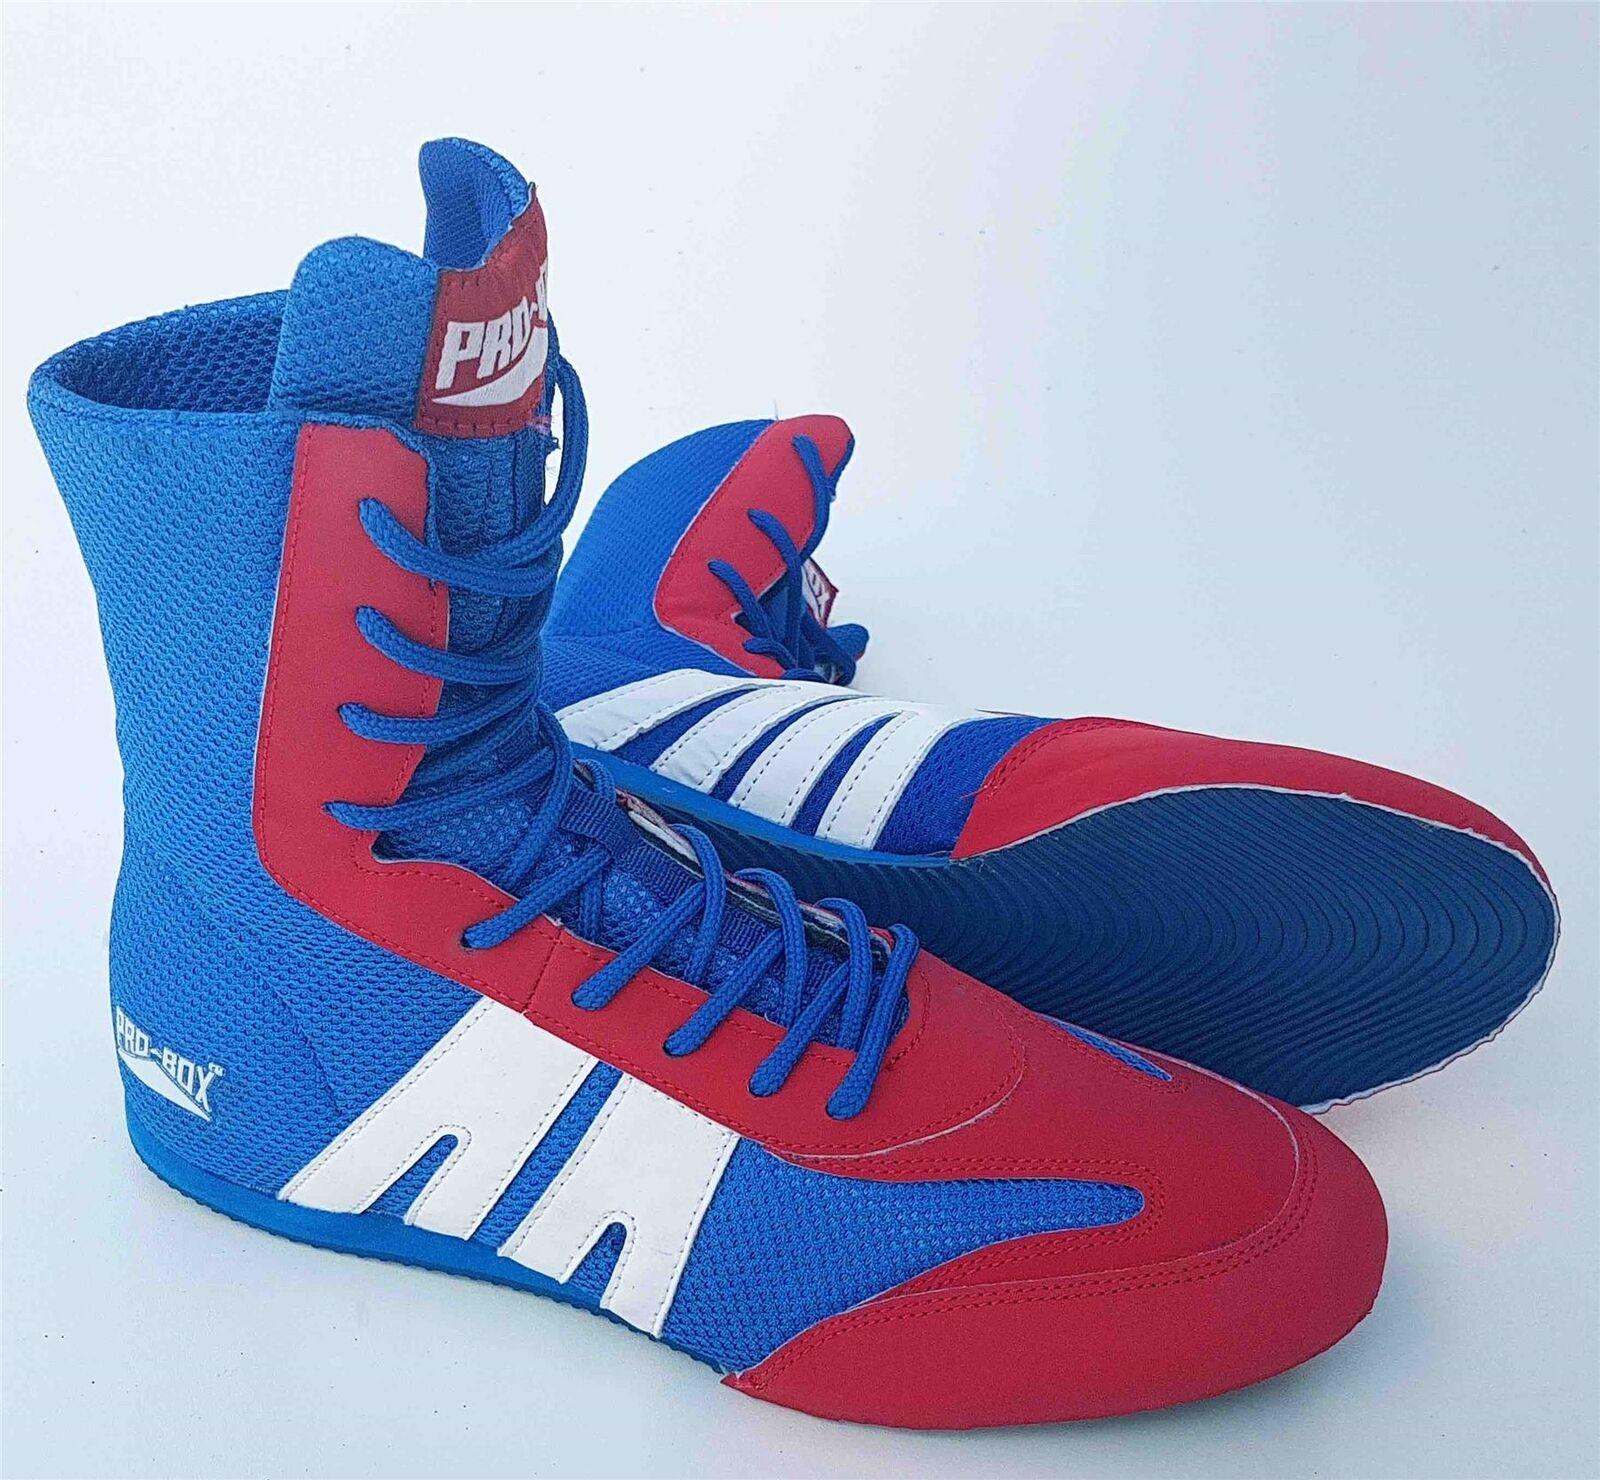 Pro Box Senior Boxing Stiefel Adults Herren daSie Blau rot Training Sparring Schuhe